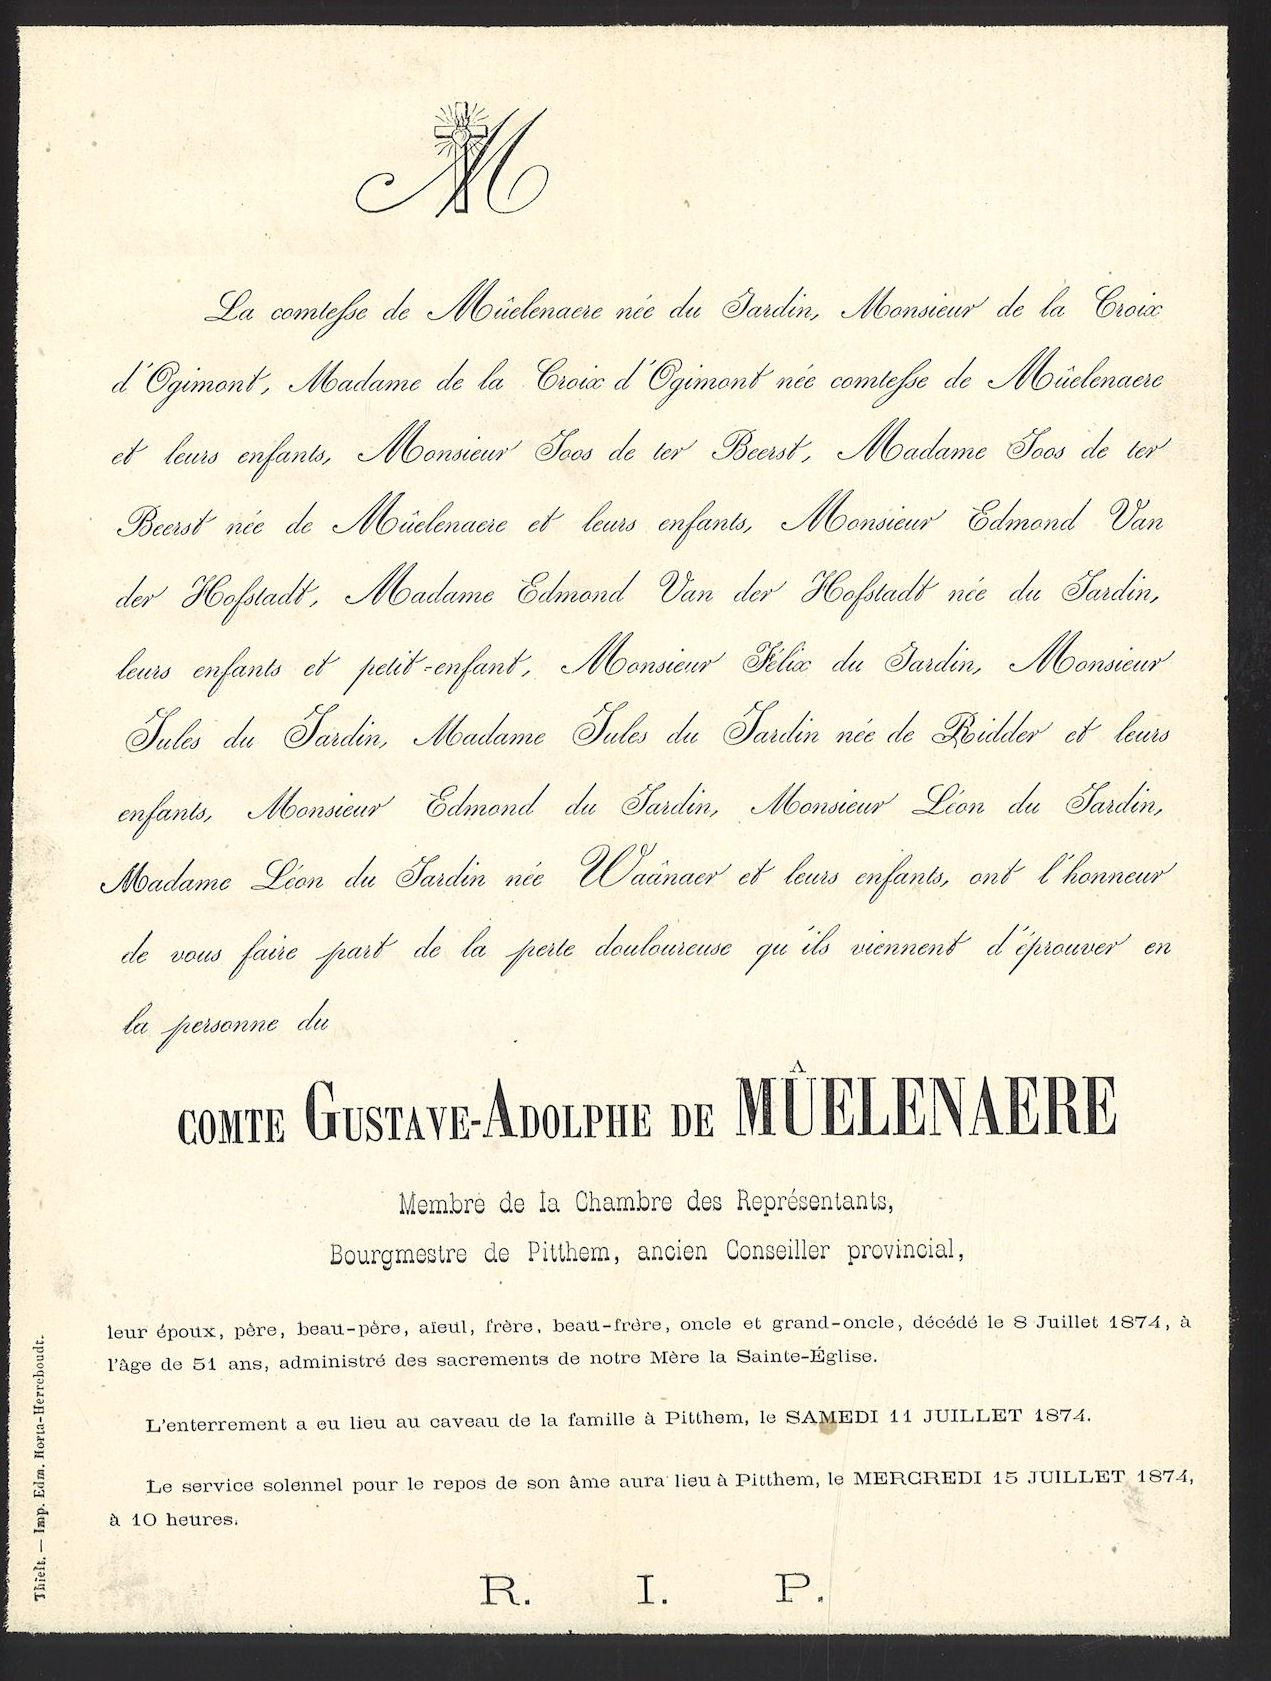 Gustave-Adolphe de Mûelenaere